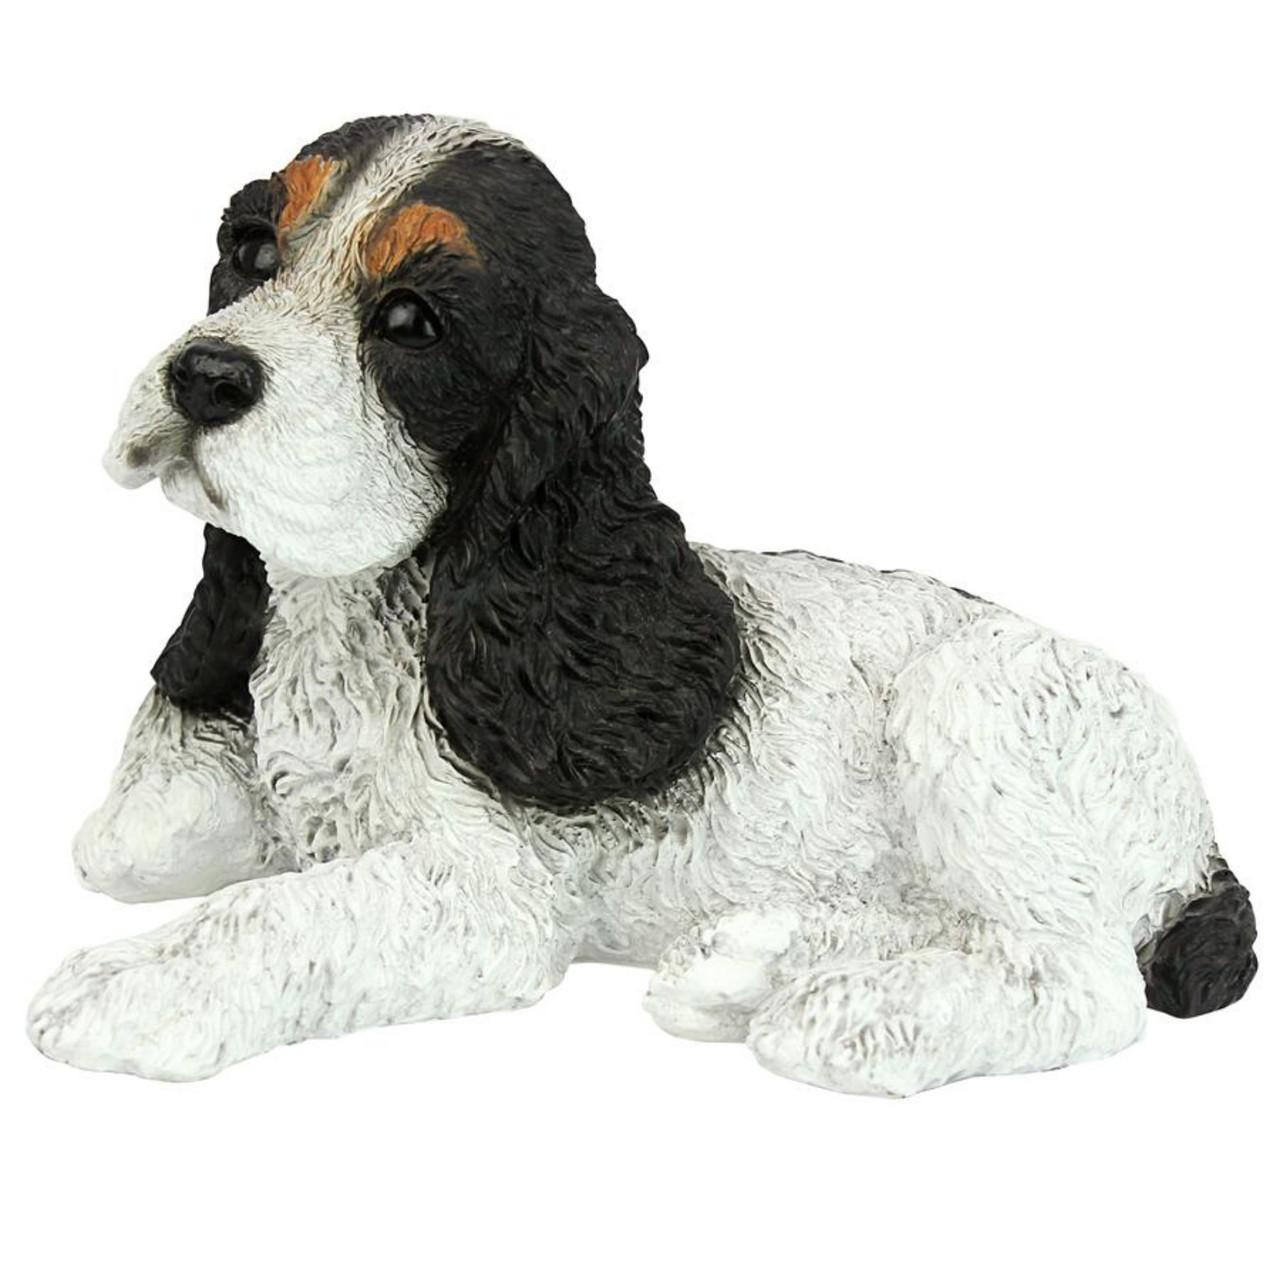 10 Sitting Black White Cocker Spaniel Puppy Dog Statue Christmas Central